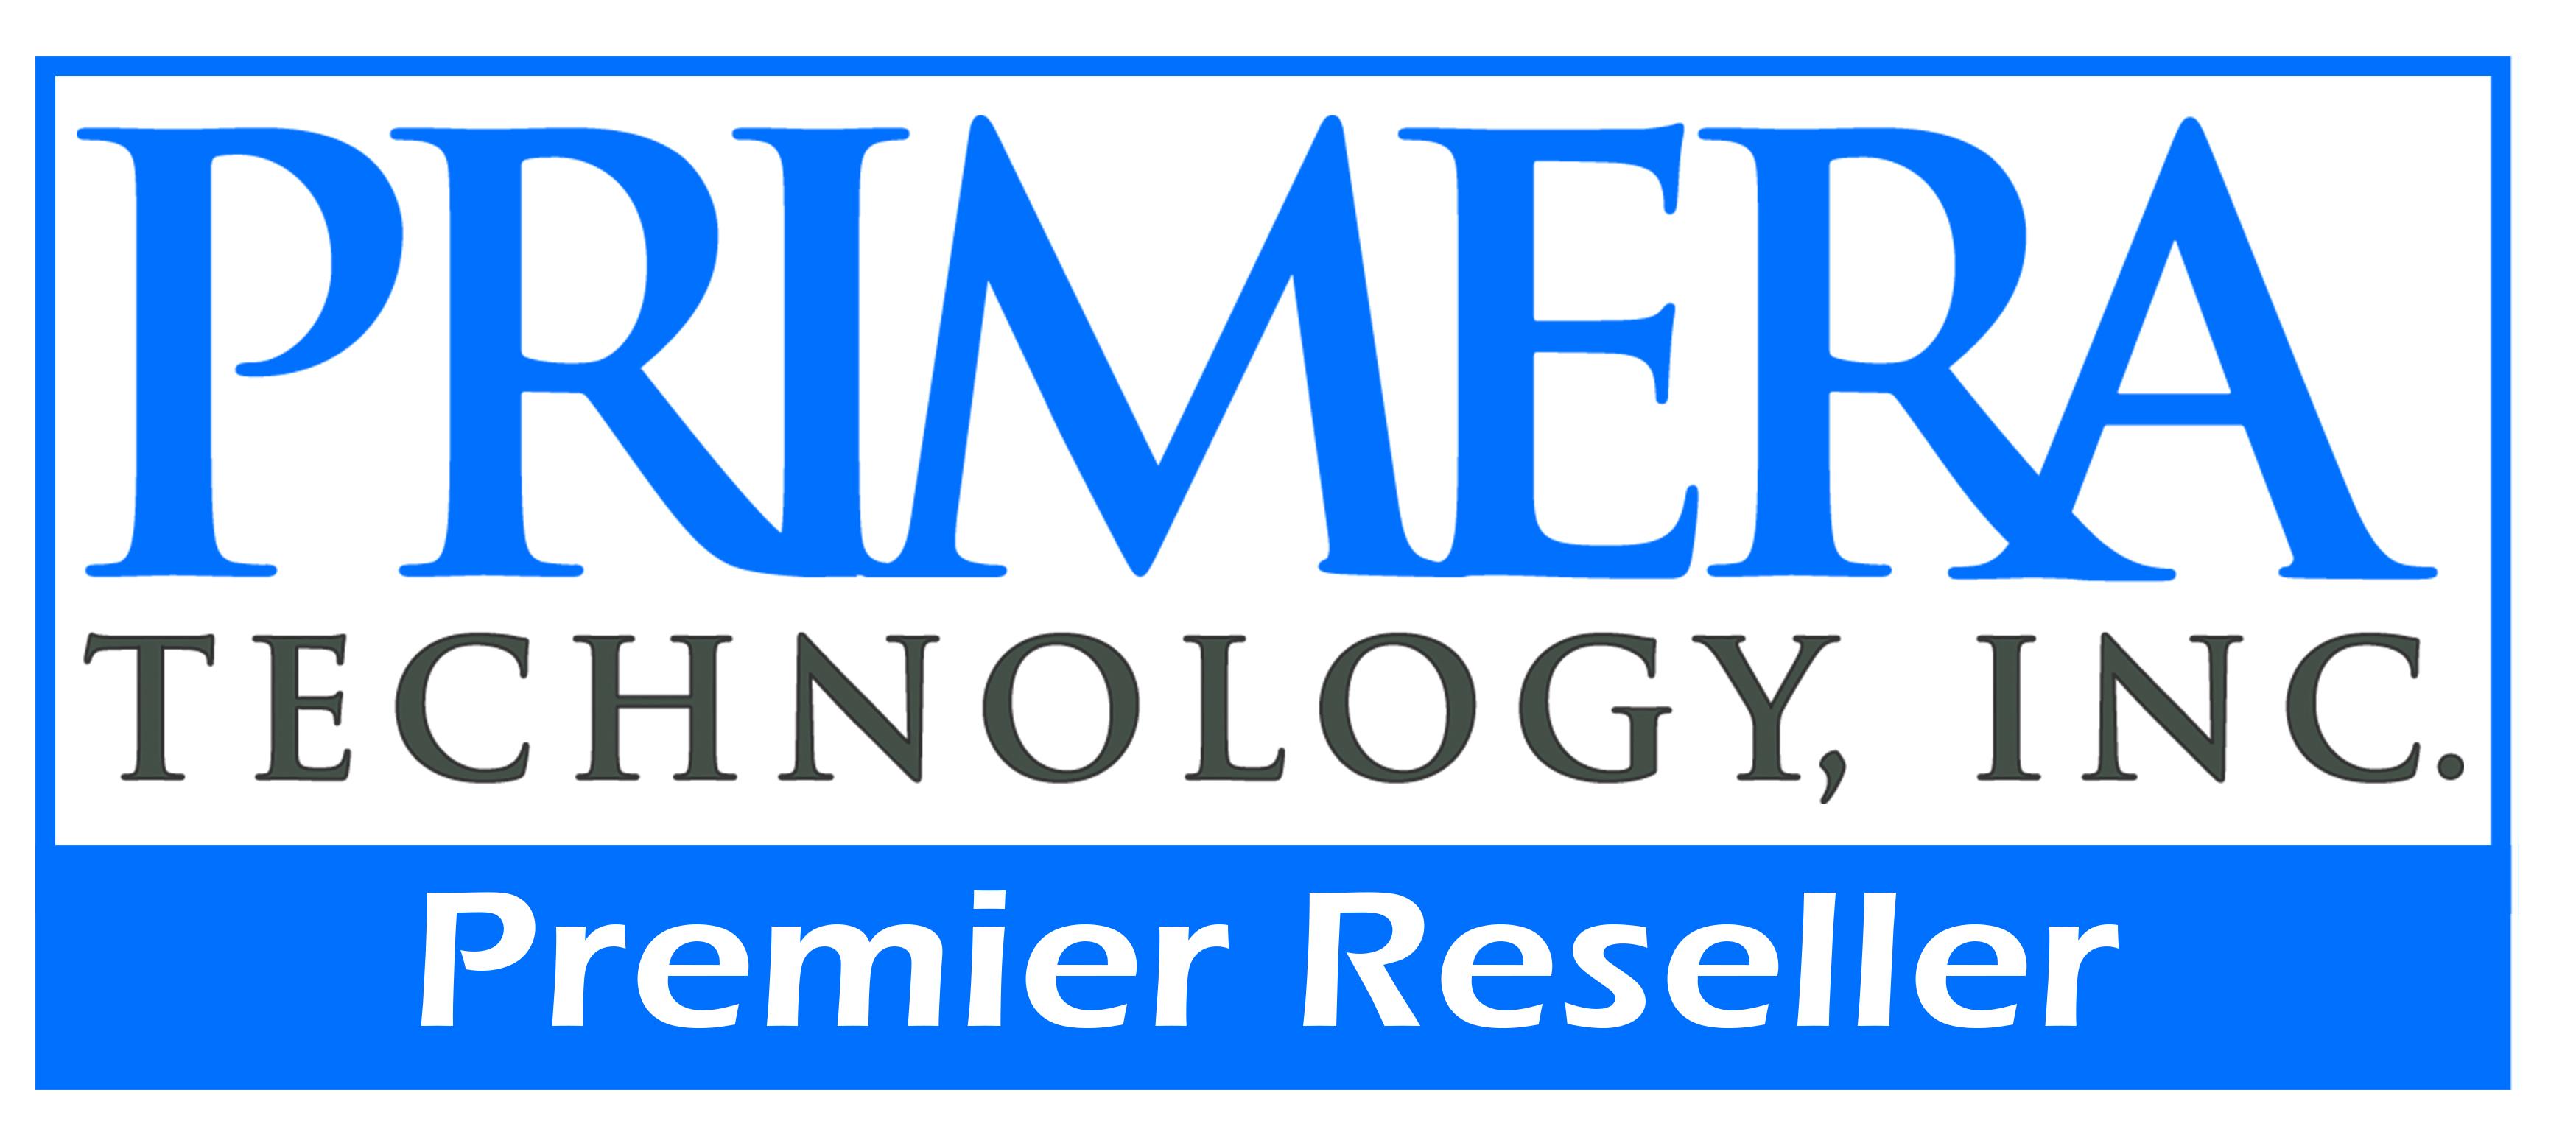 primera-premier-reseller-logo.jpg